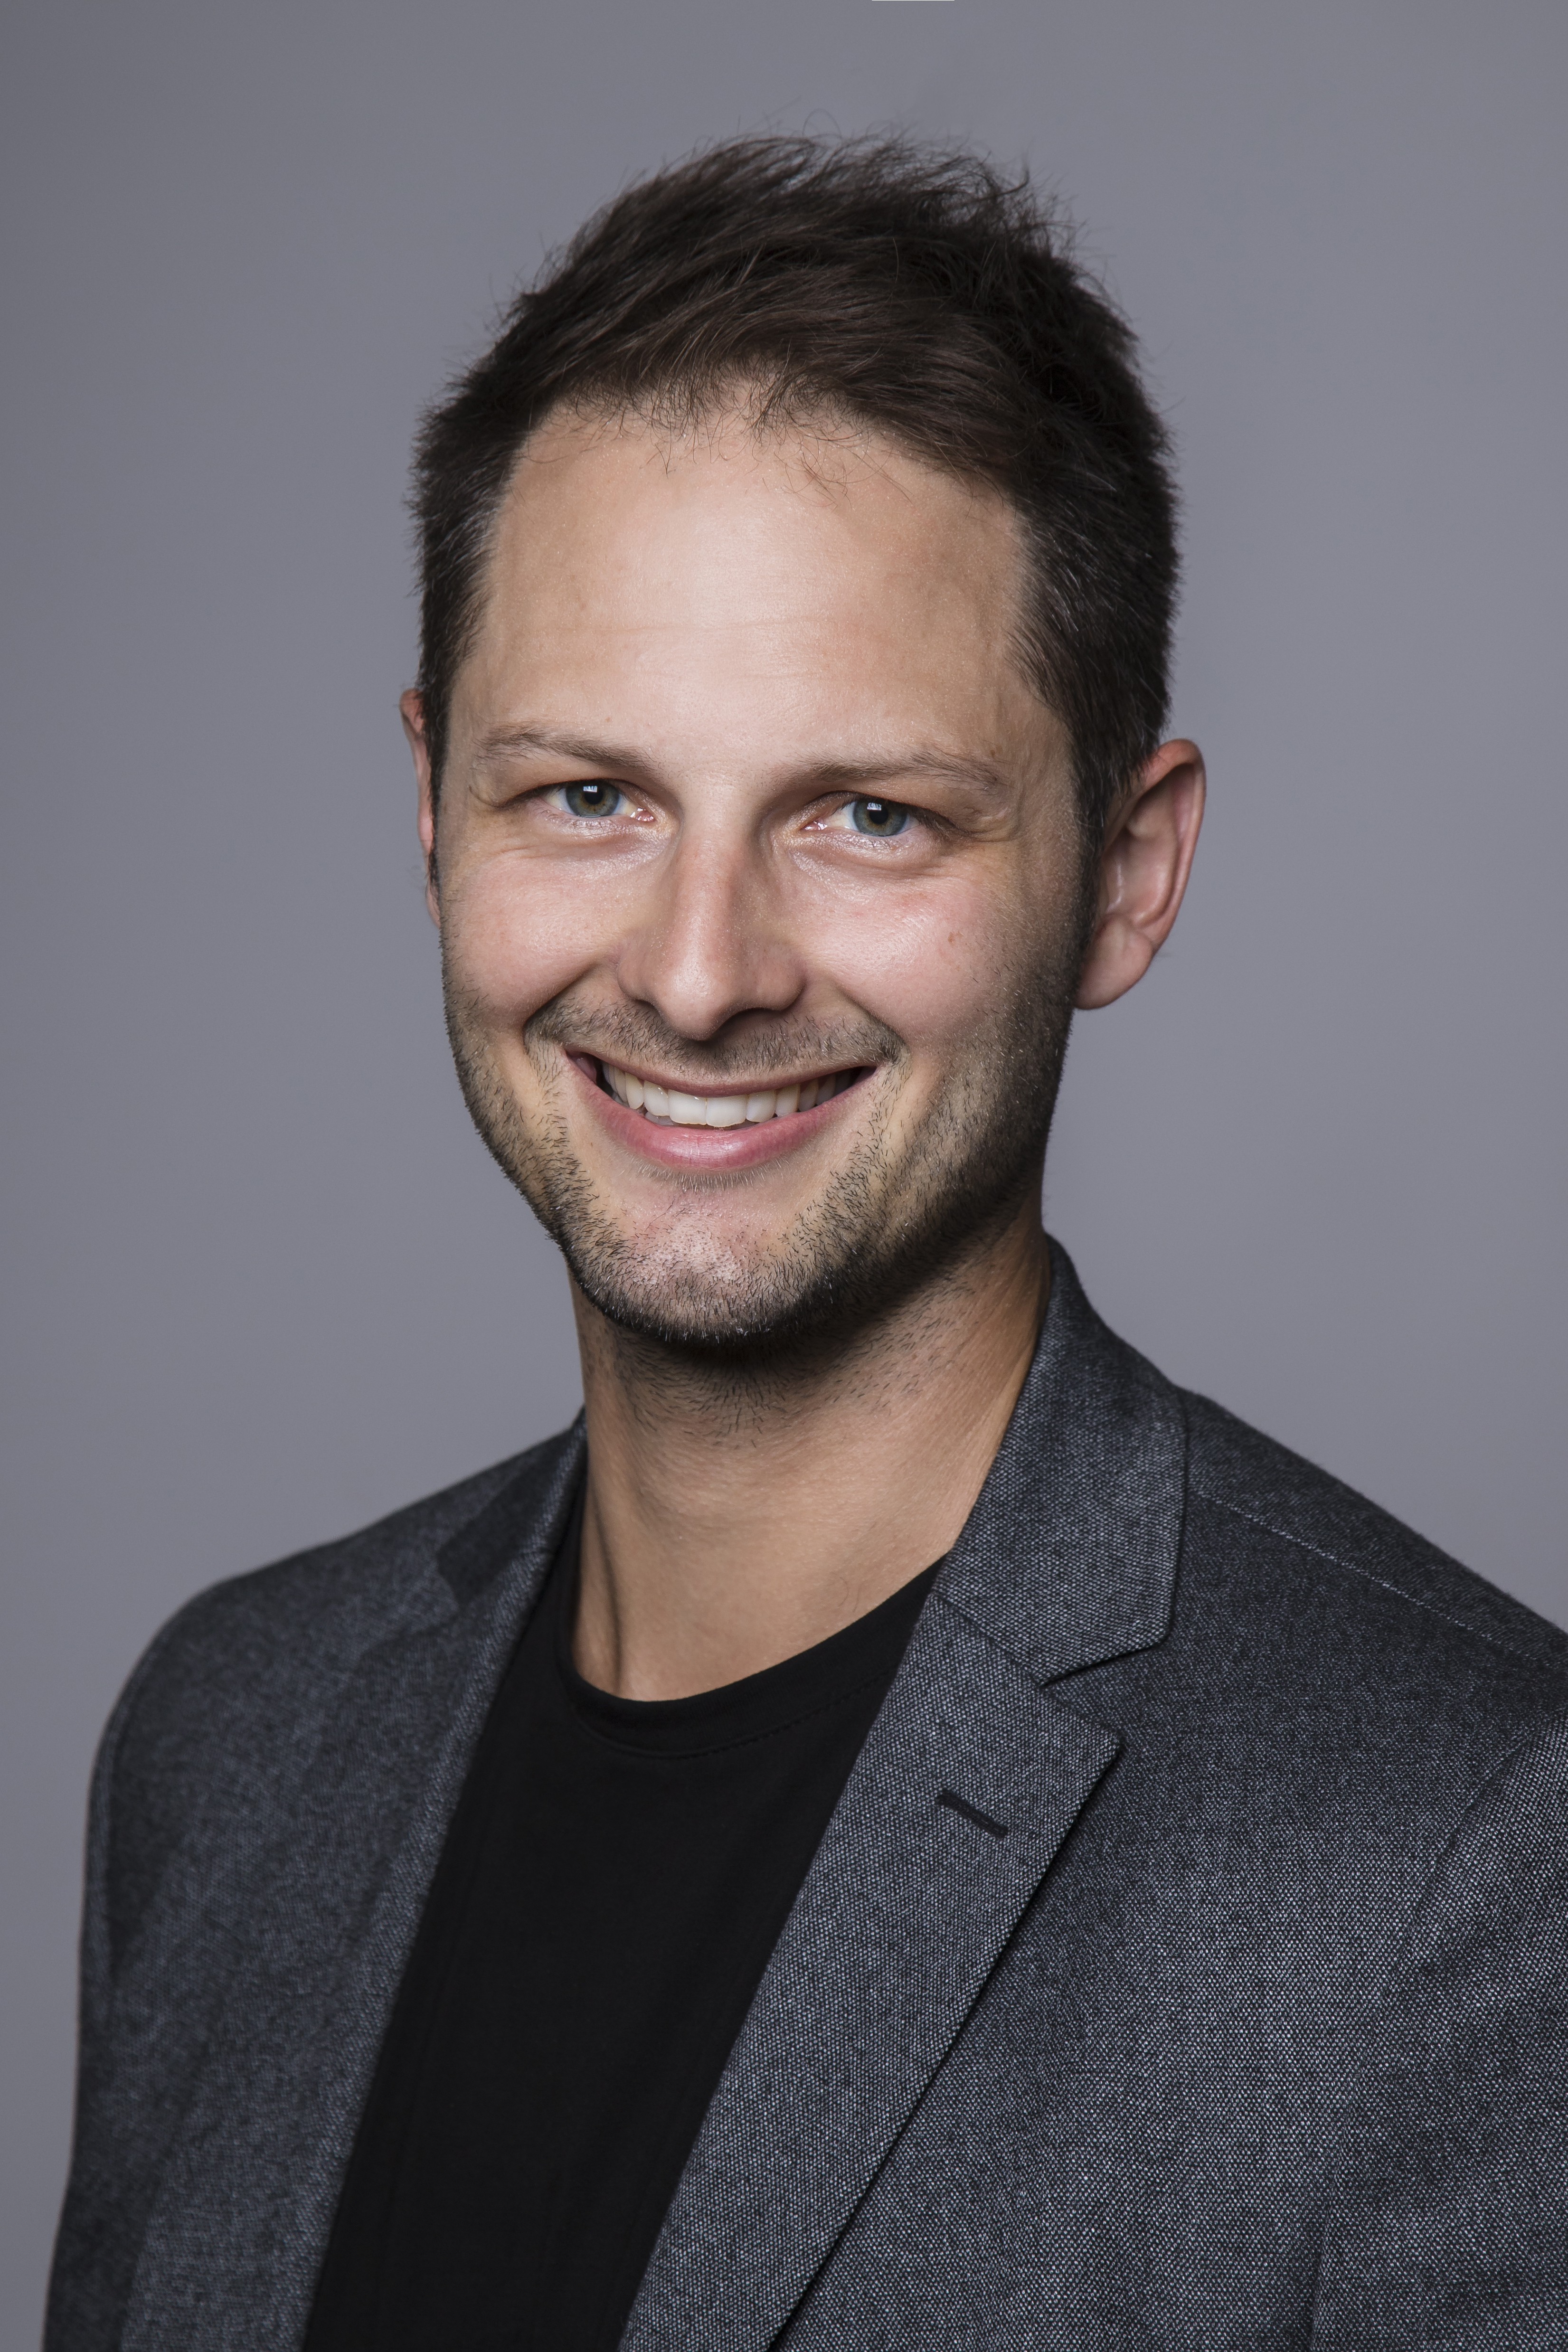 Michael Rietmann